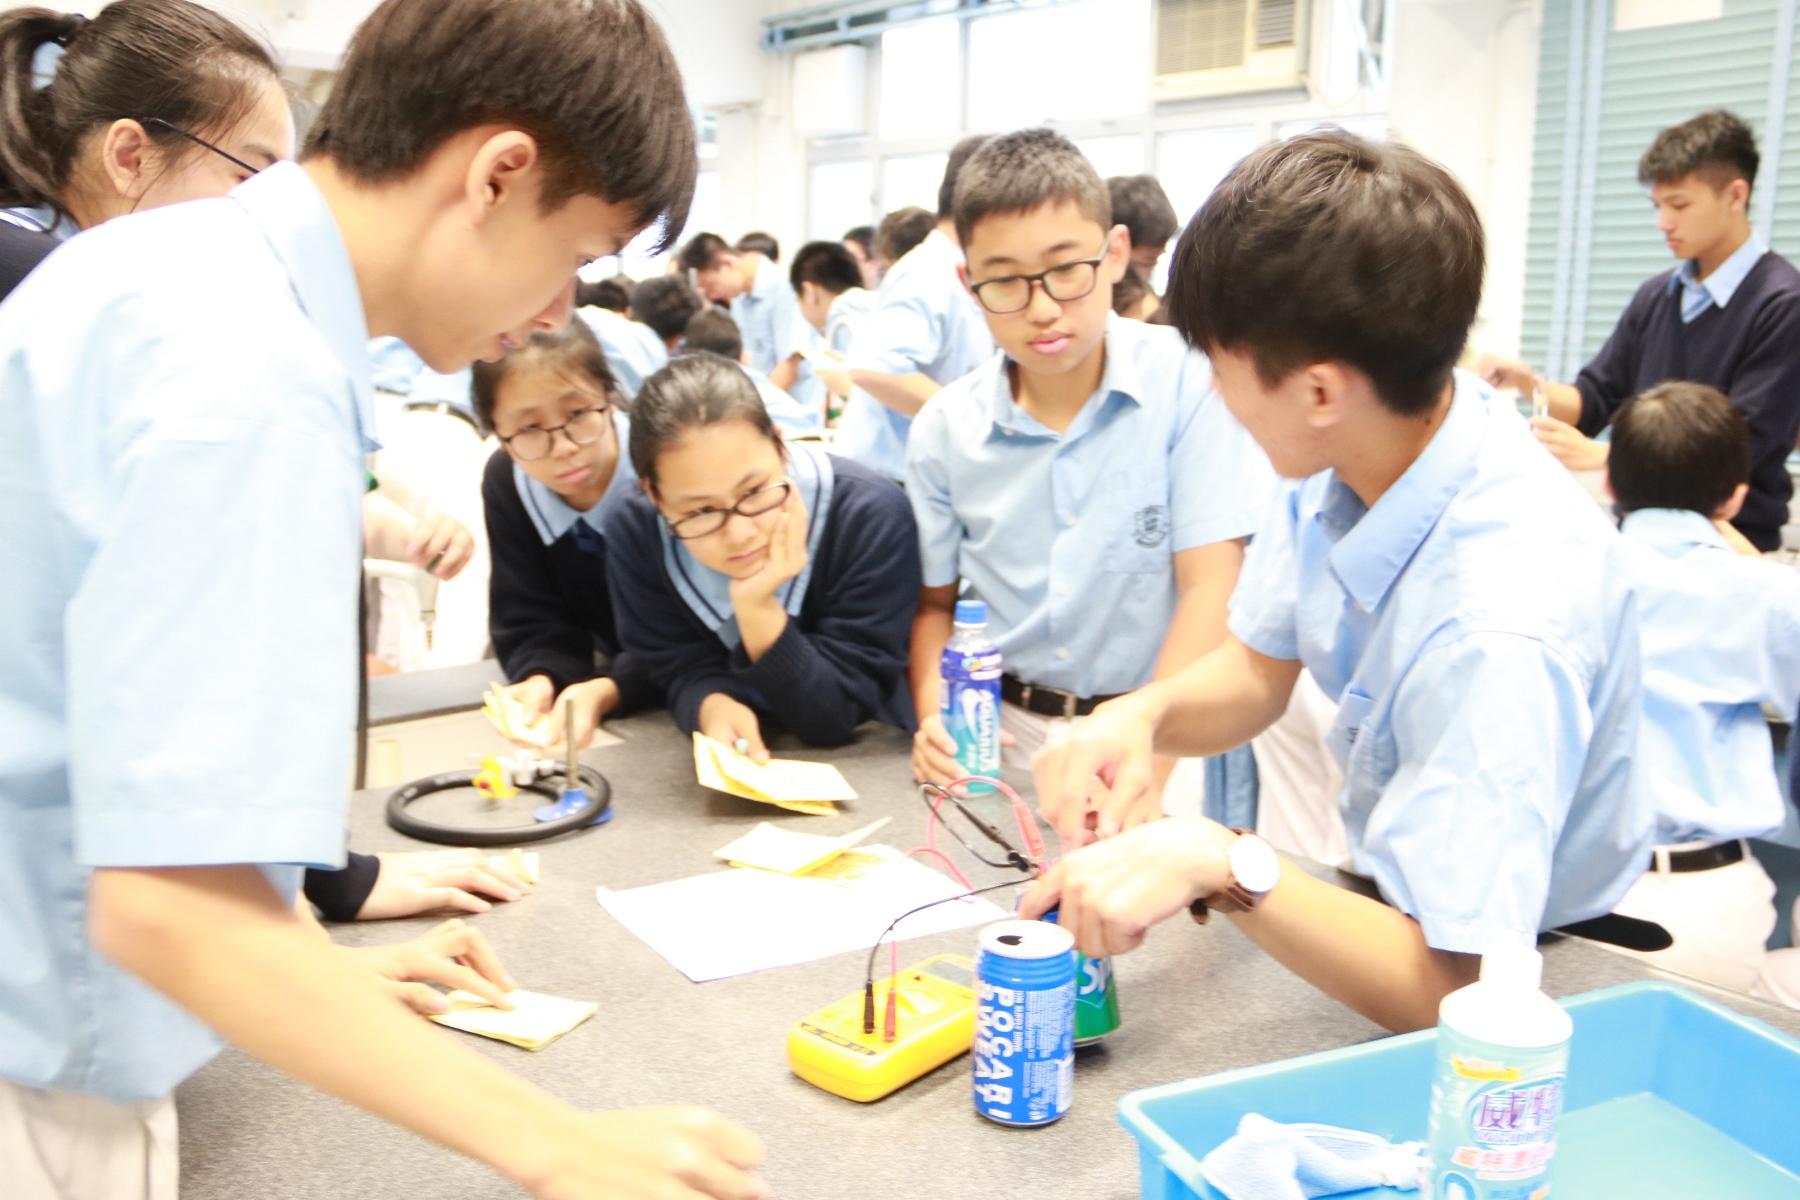 http://www.npc.edu.hk/sites/default/files/img_7299.jpg